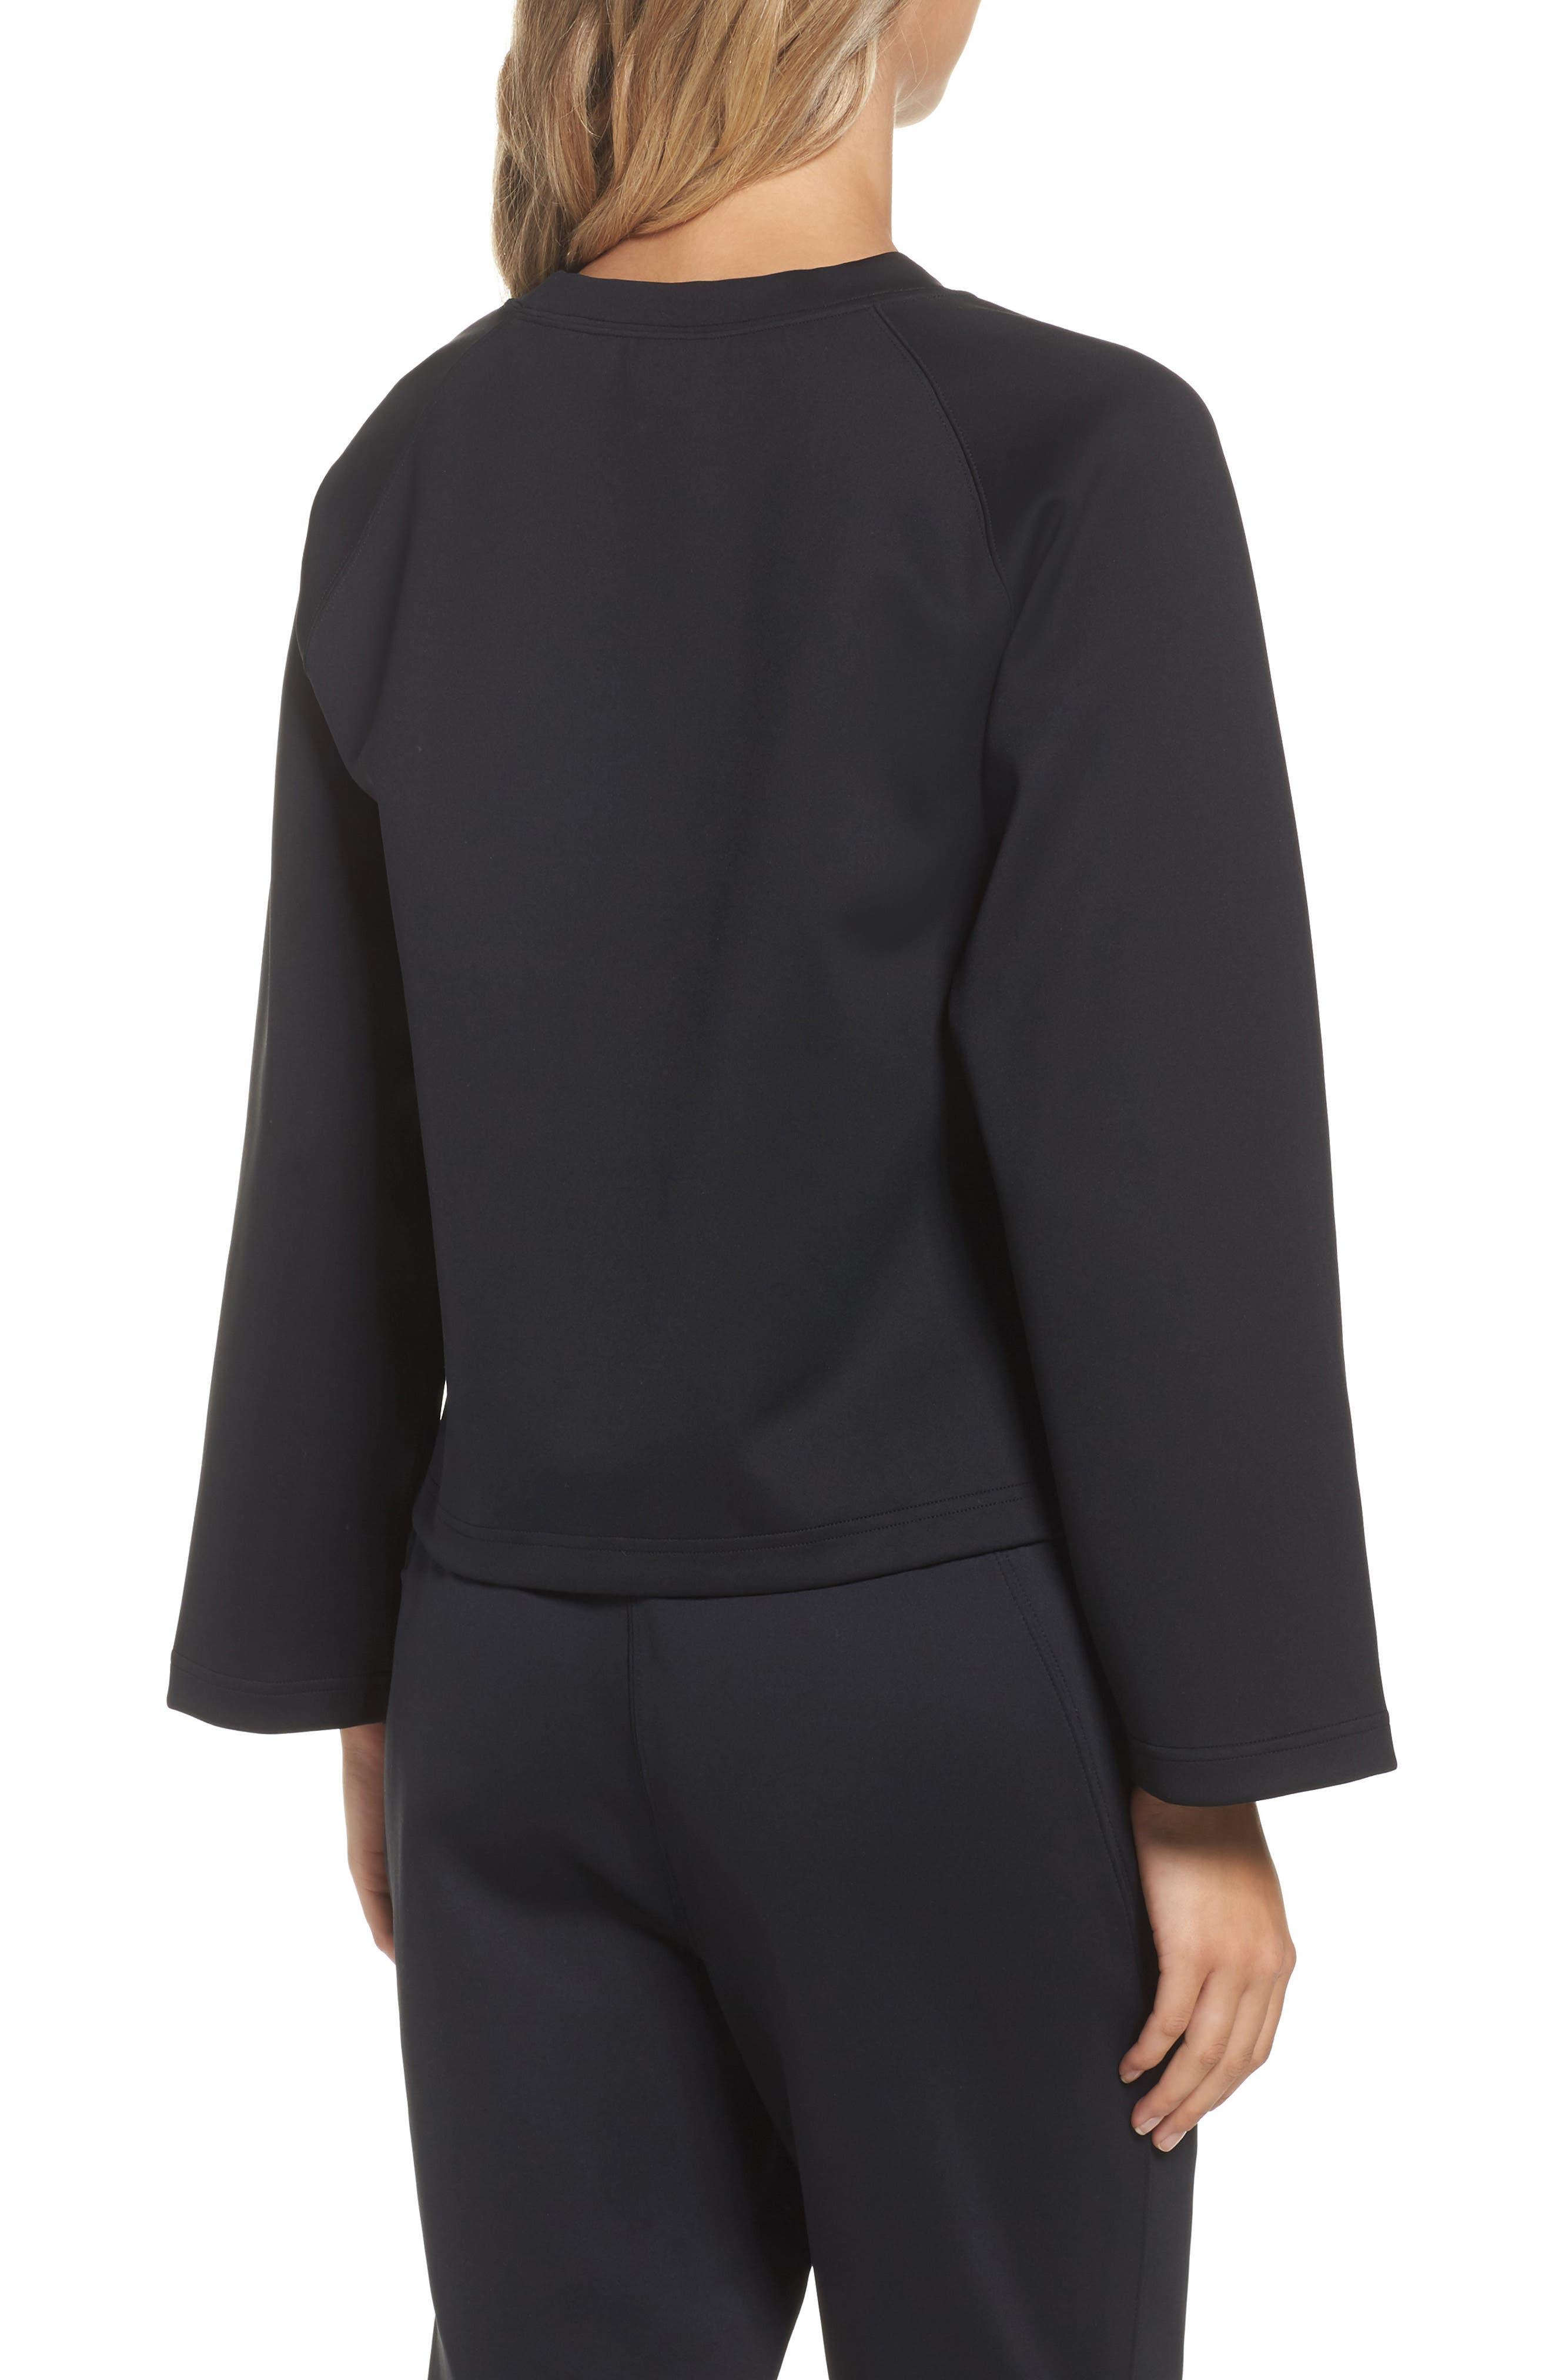 NikeLab Essentials Women's Fleece Top,                             Alternate thumbnail 3, color,